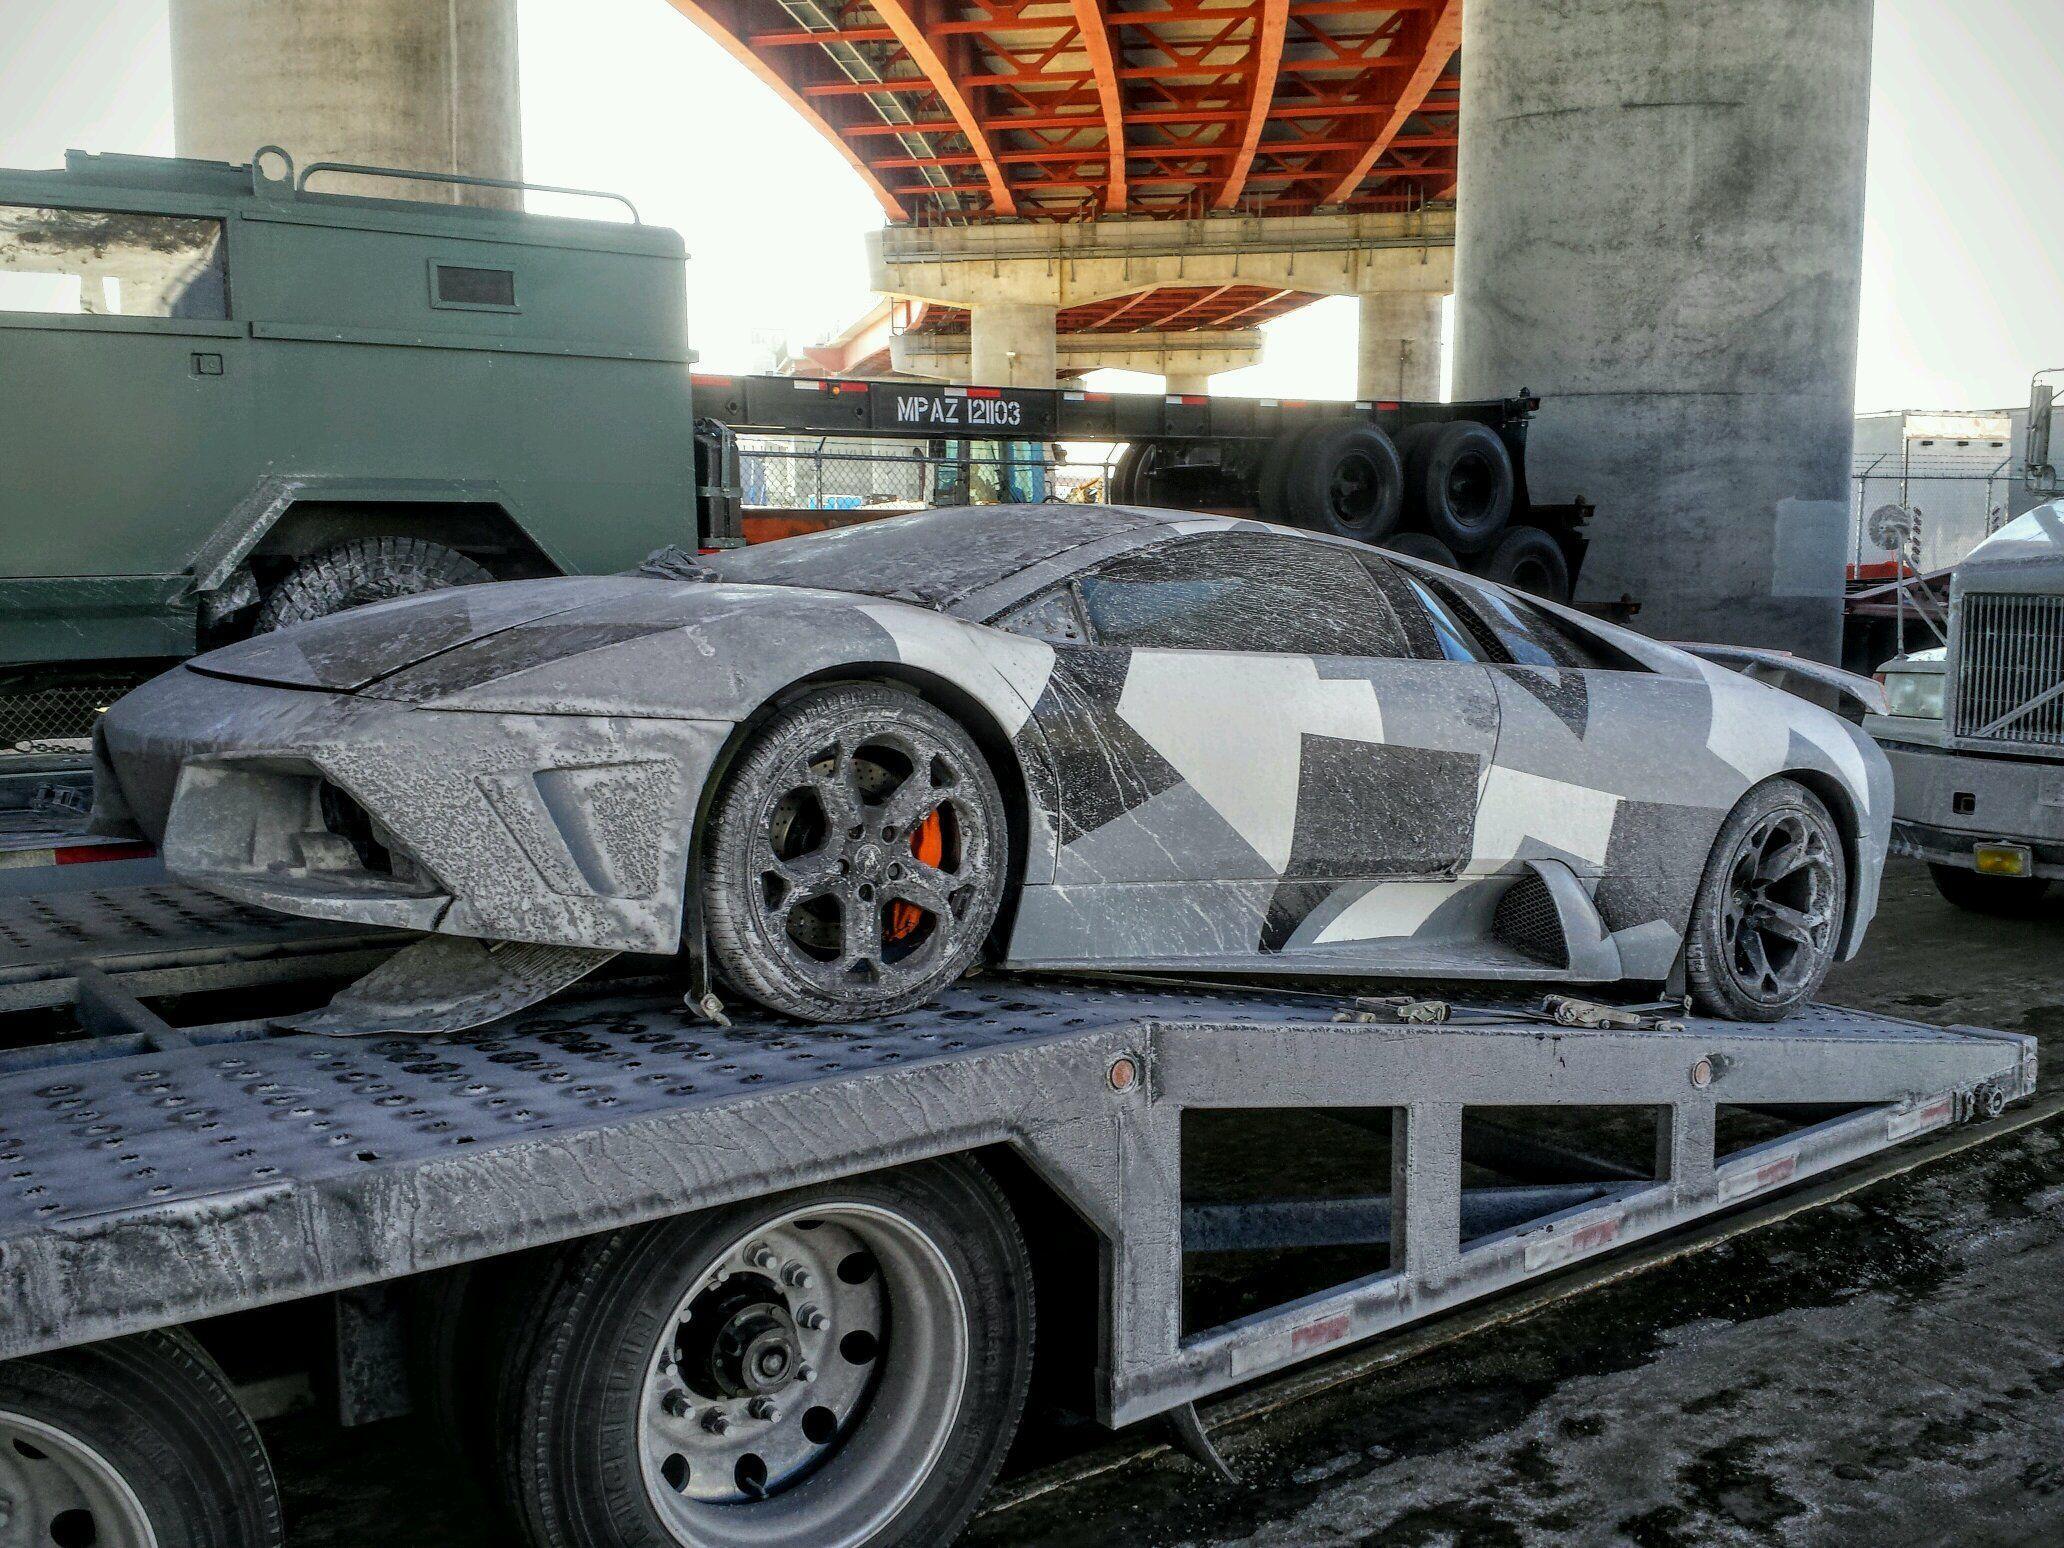 Fast Furious 8 Cars Wallpaper Phone - Simonwil.com